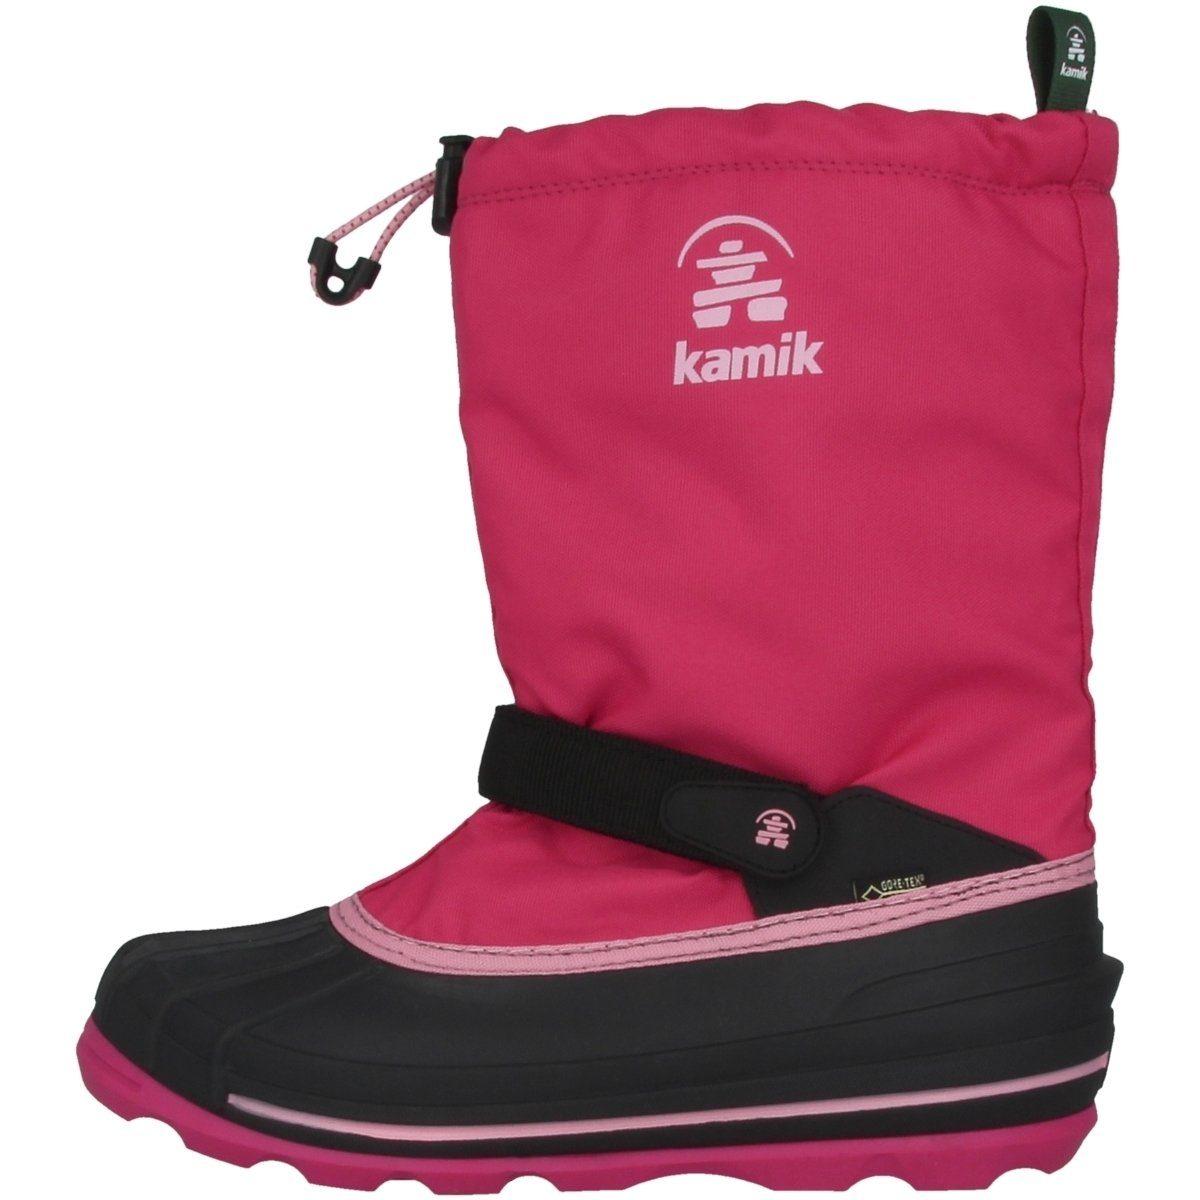 Esprit F_cleo Backpack Rucksack Tasche Black Schwarz Neu Duftendes Aroma Kindermode, Schuhe & Access. Rucksäcke